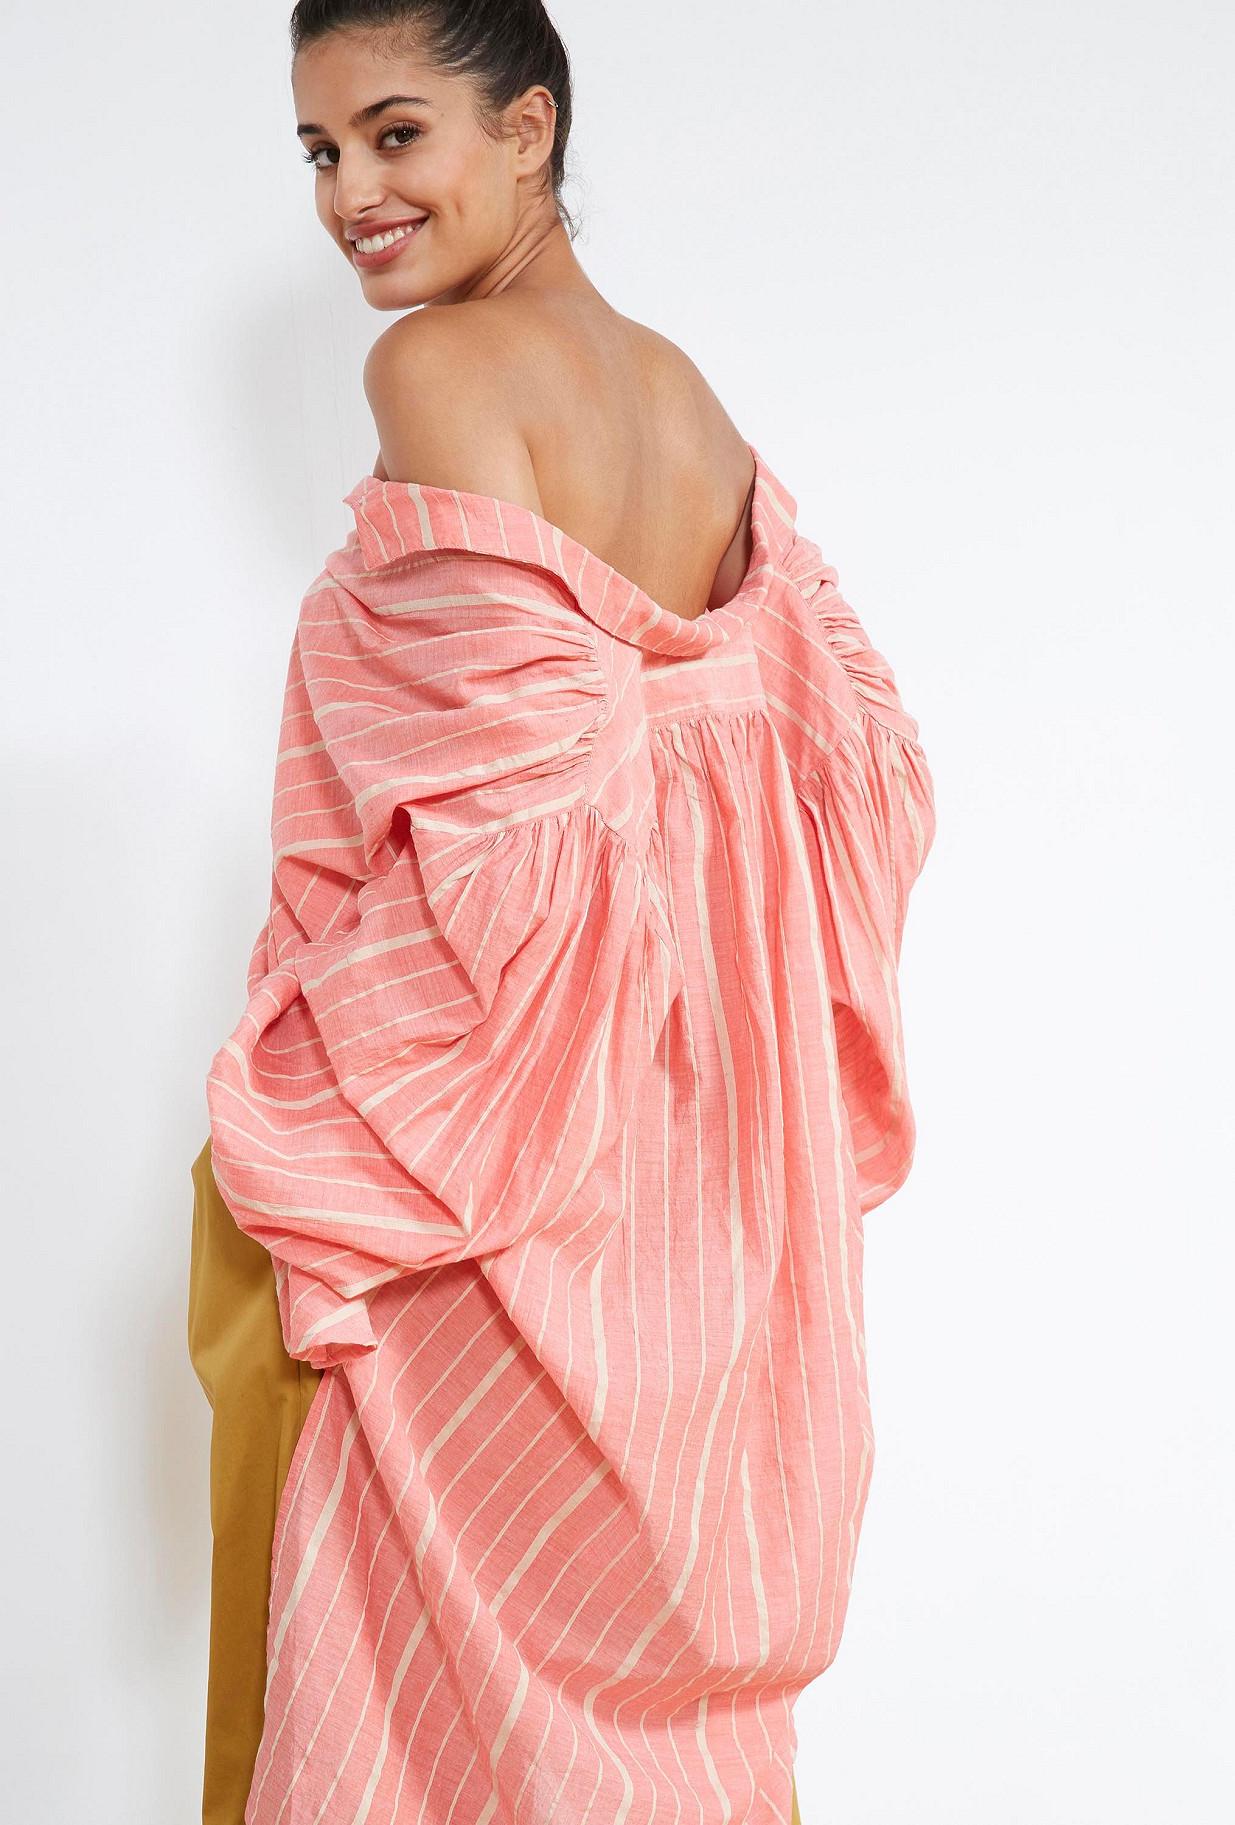 clothes store SHIRT  Kelly french designer fashion Paris